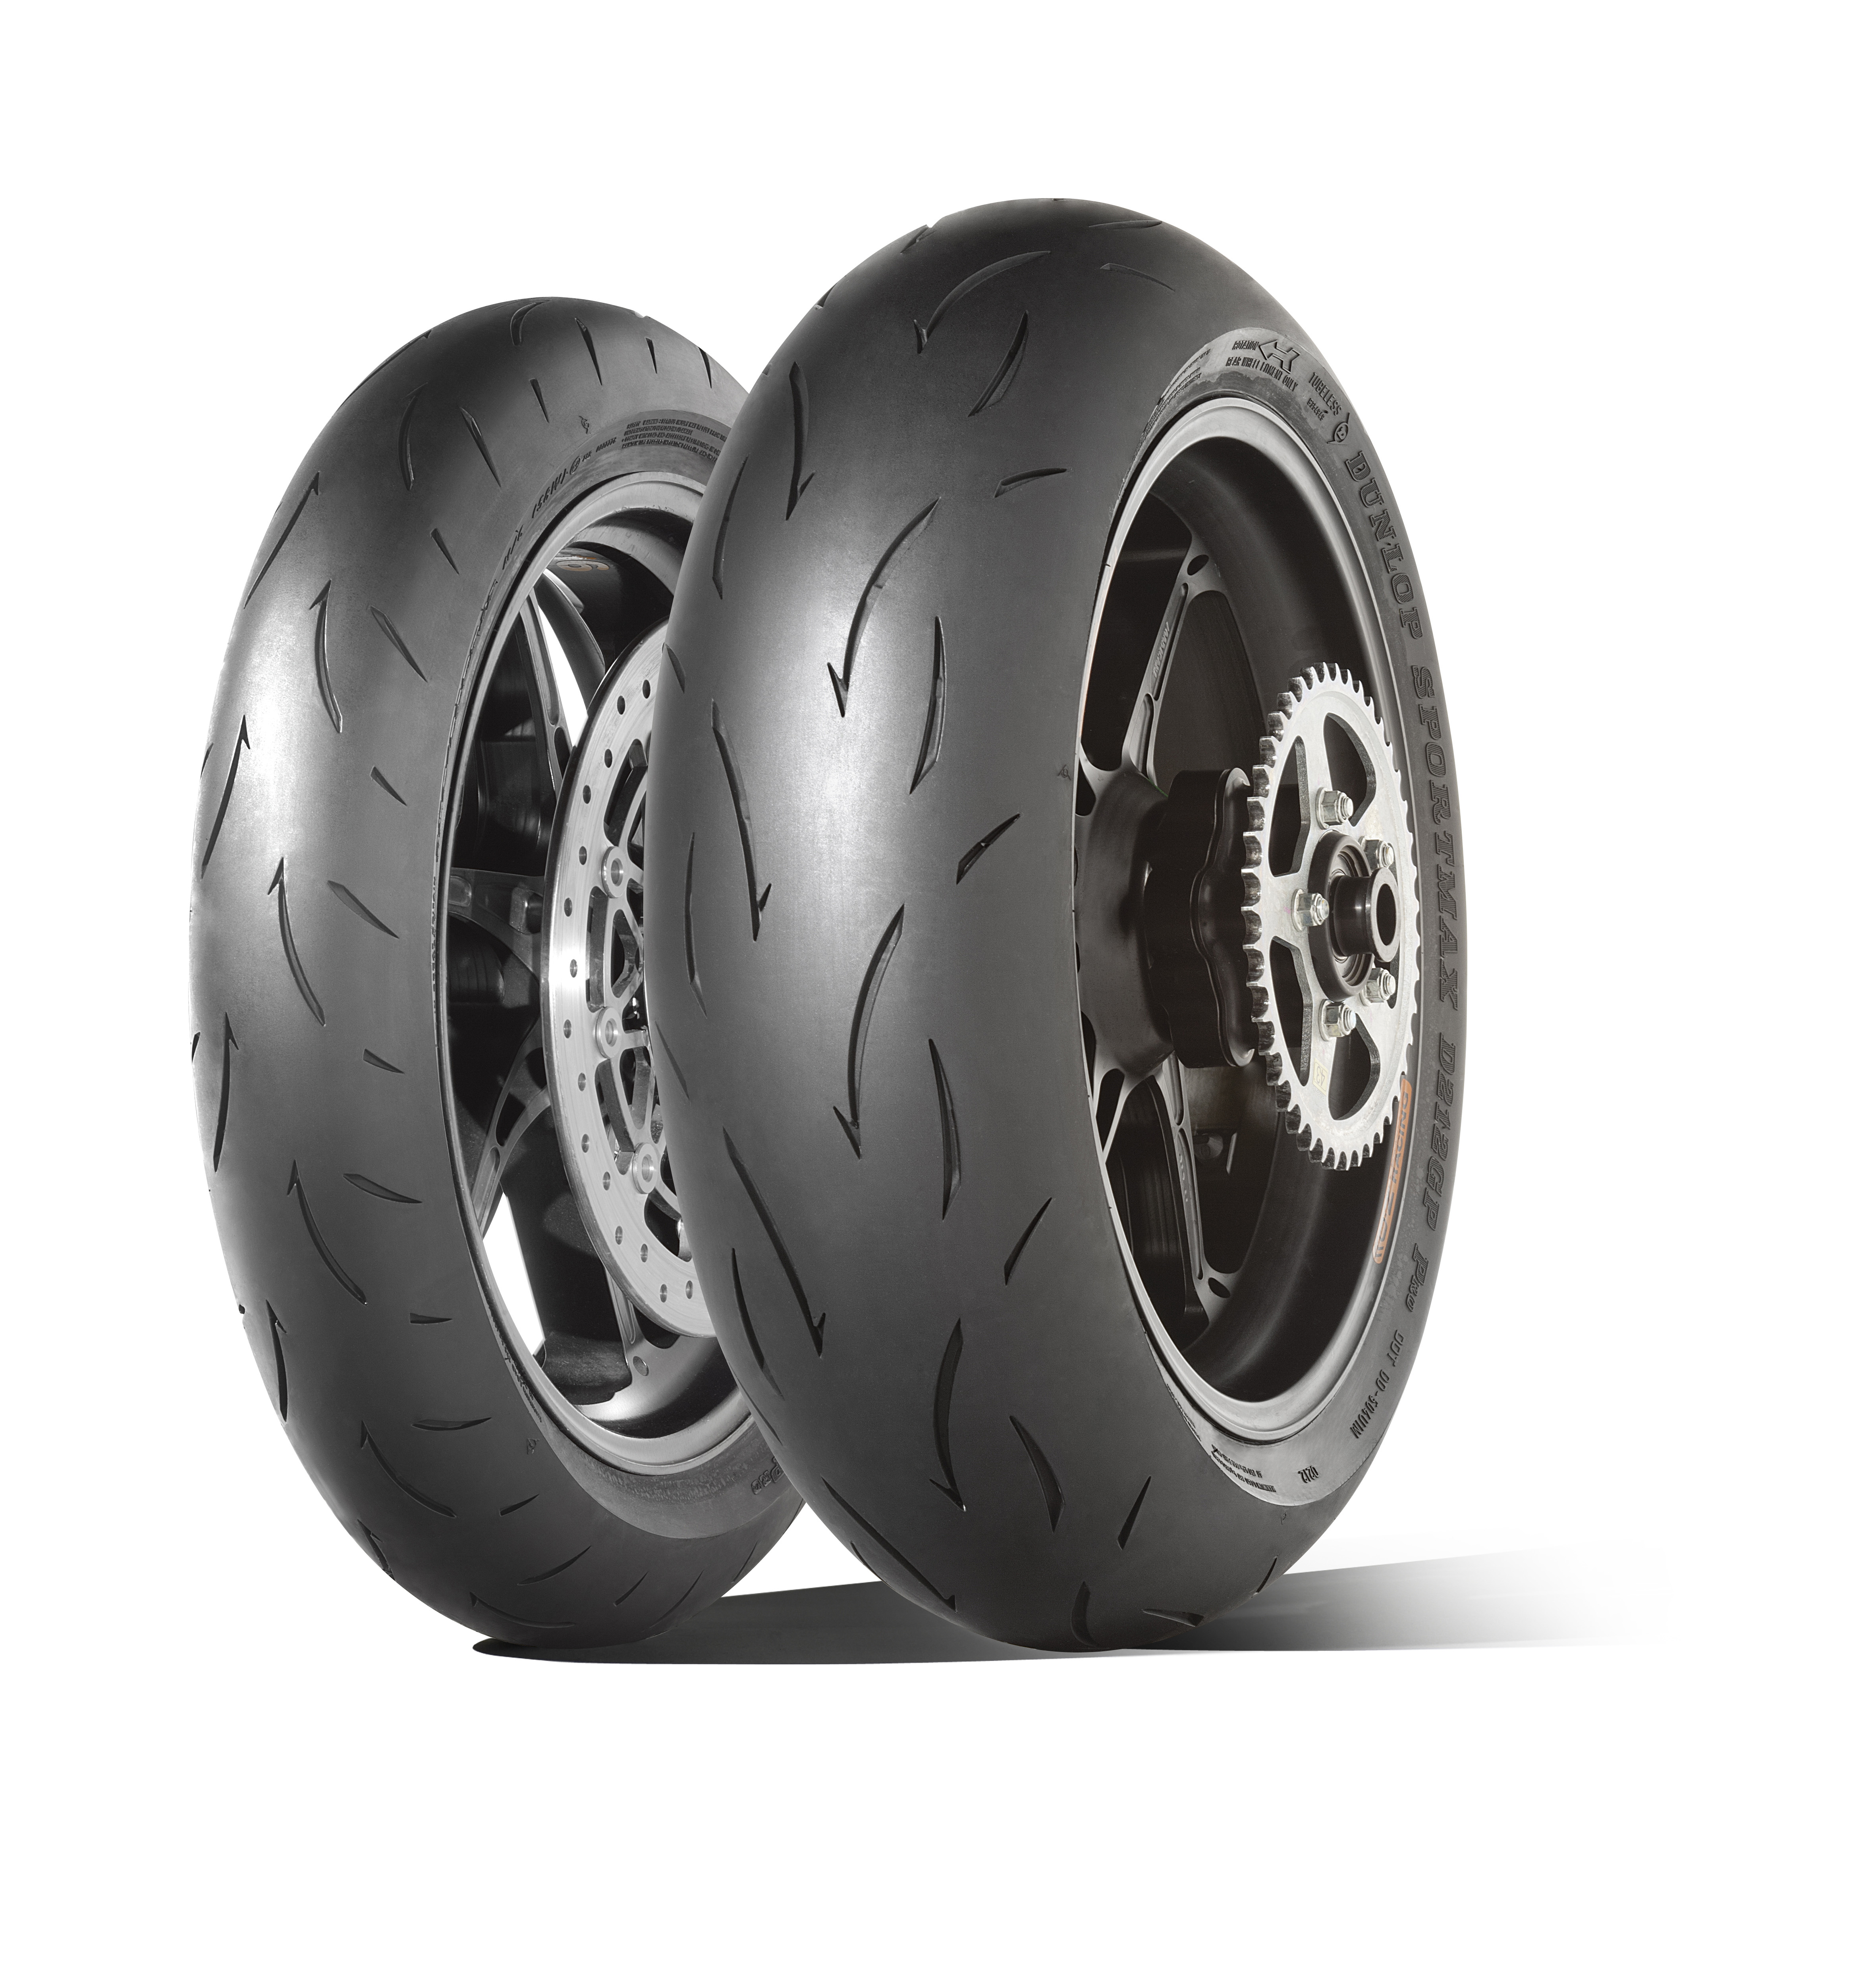 мотошины Dunlop Sportmax D212 GP Pro MS2 120/70 R17 58W